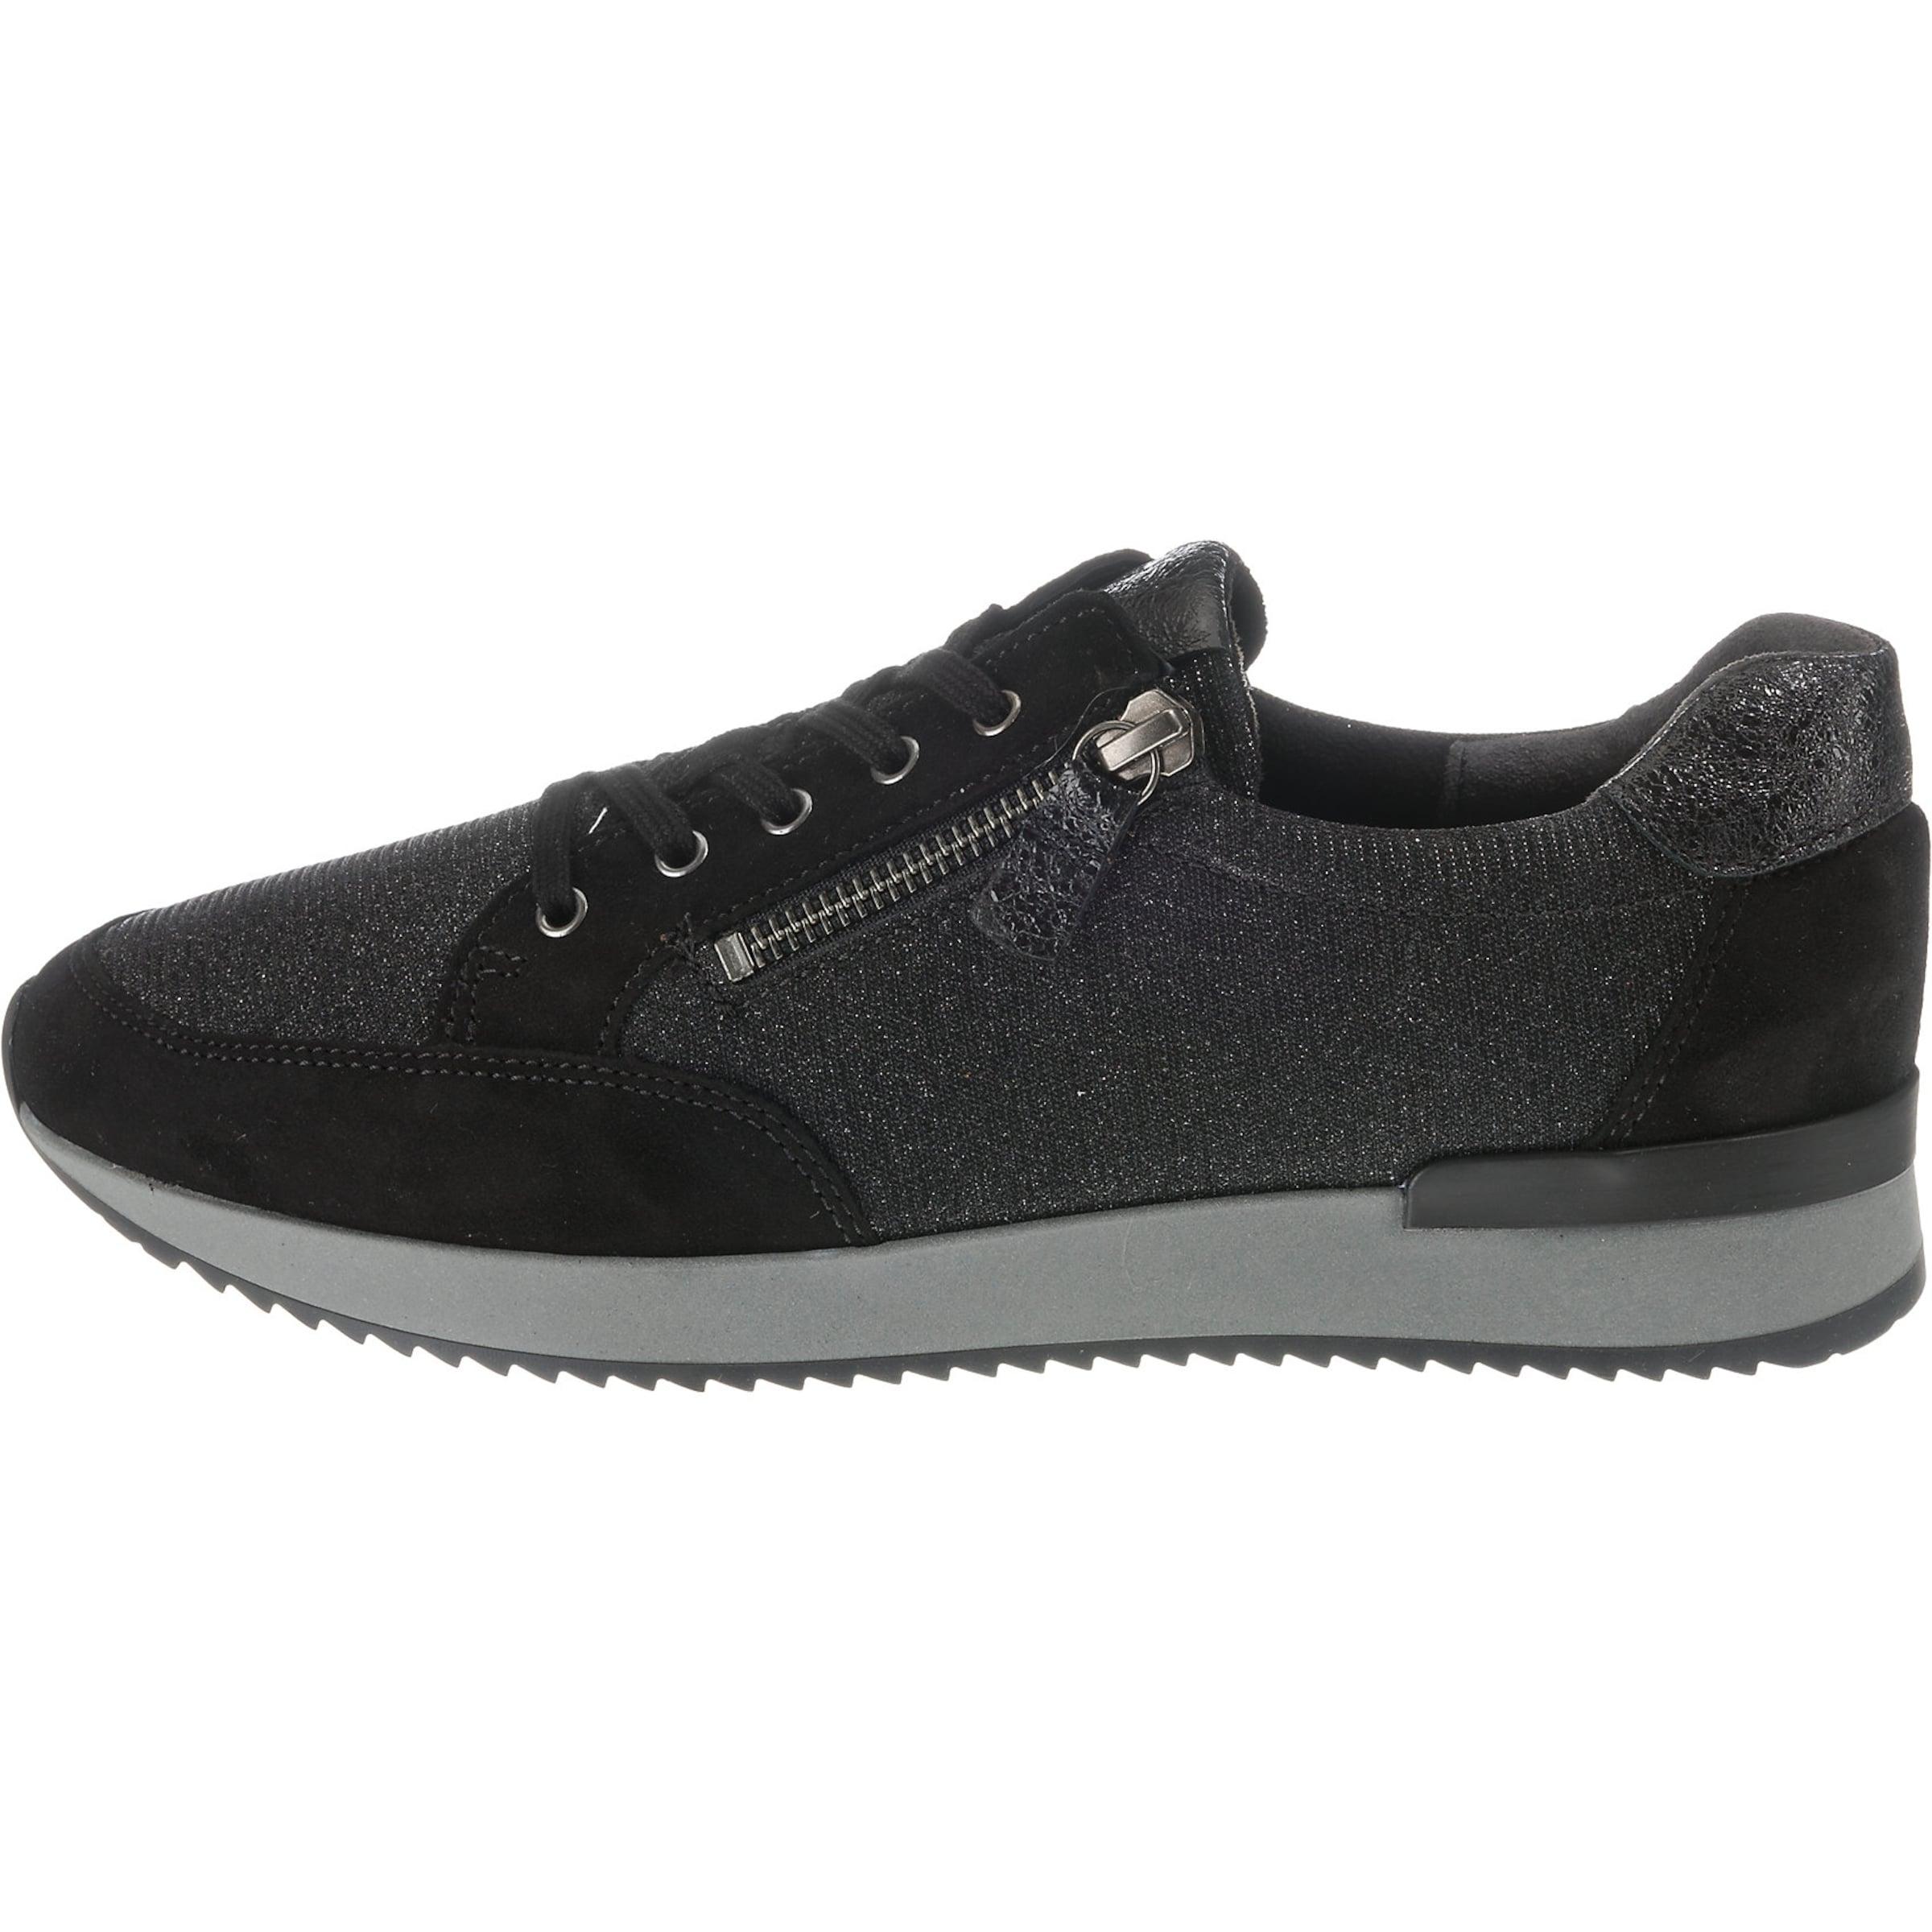 DunkelgrauSchwarz Gabor DunkelgrauSchwarz Sneakers Gabor In Gabor Sneakers In lFKJ1c